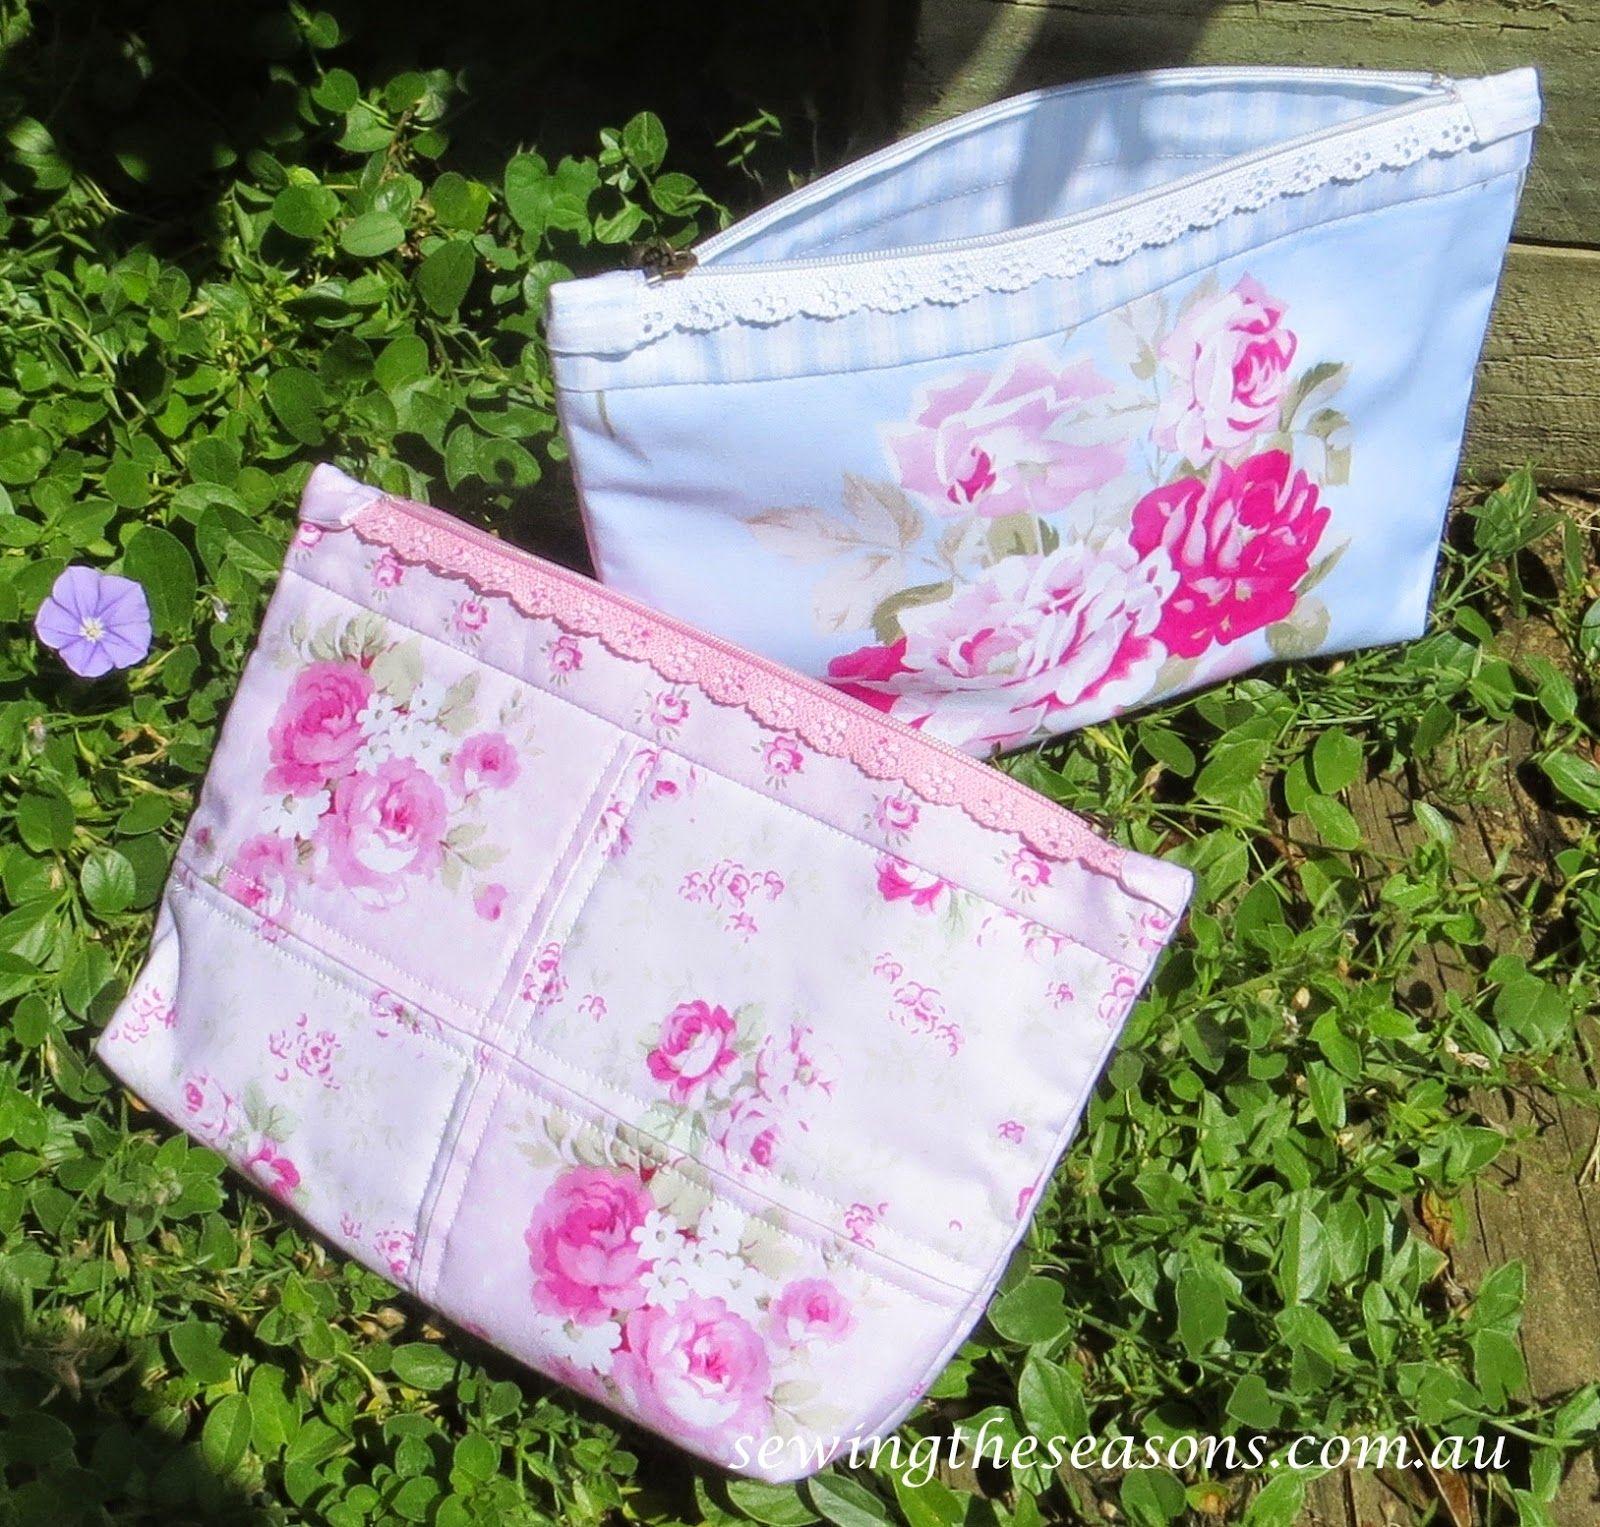 Sewing The Seasons: Tutorial - Filigree Zippered Purse